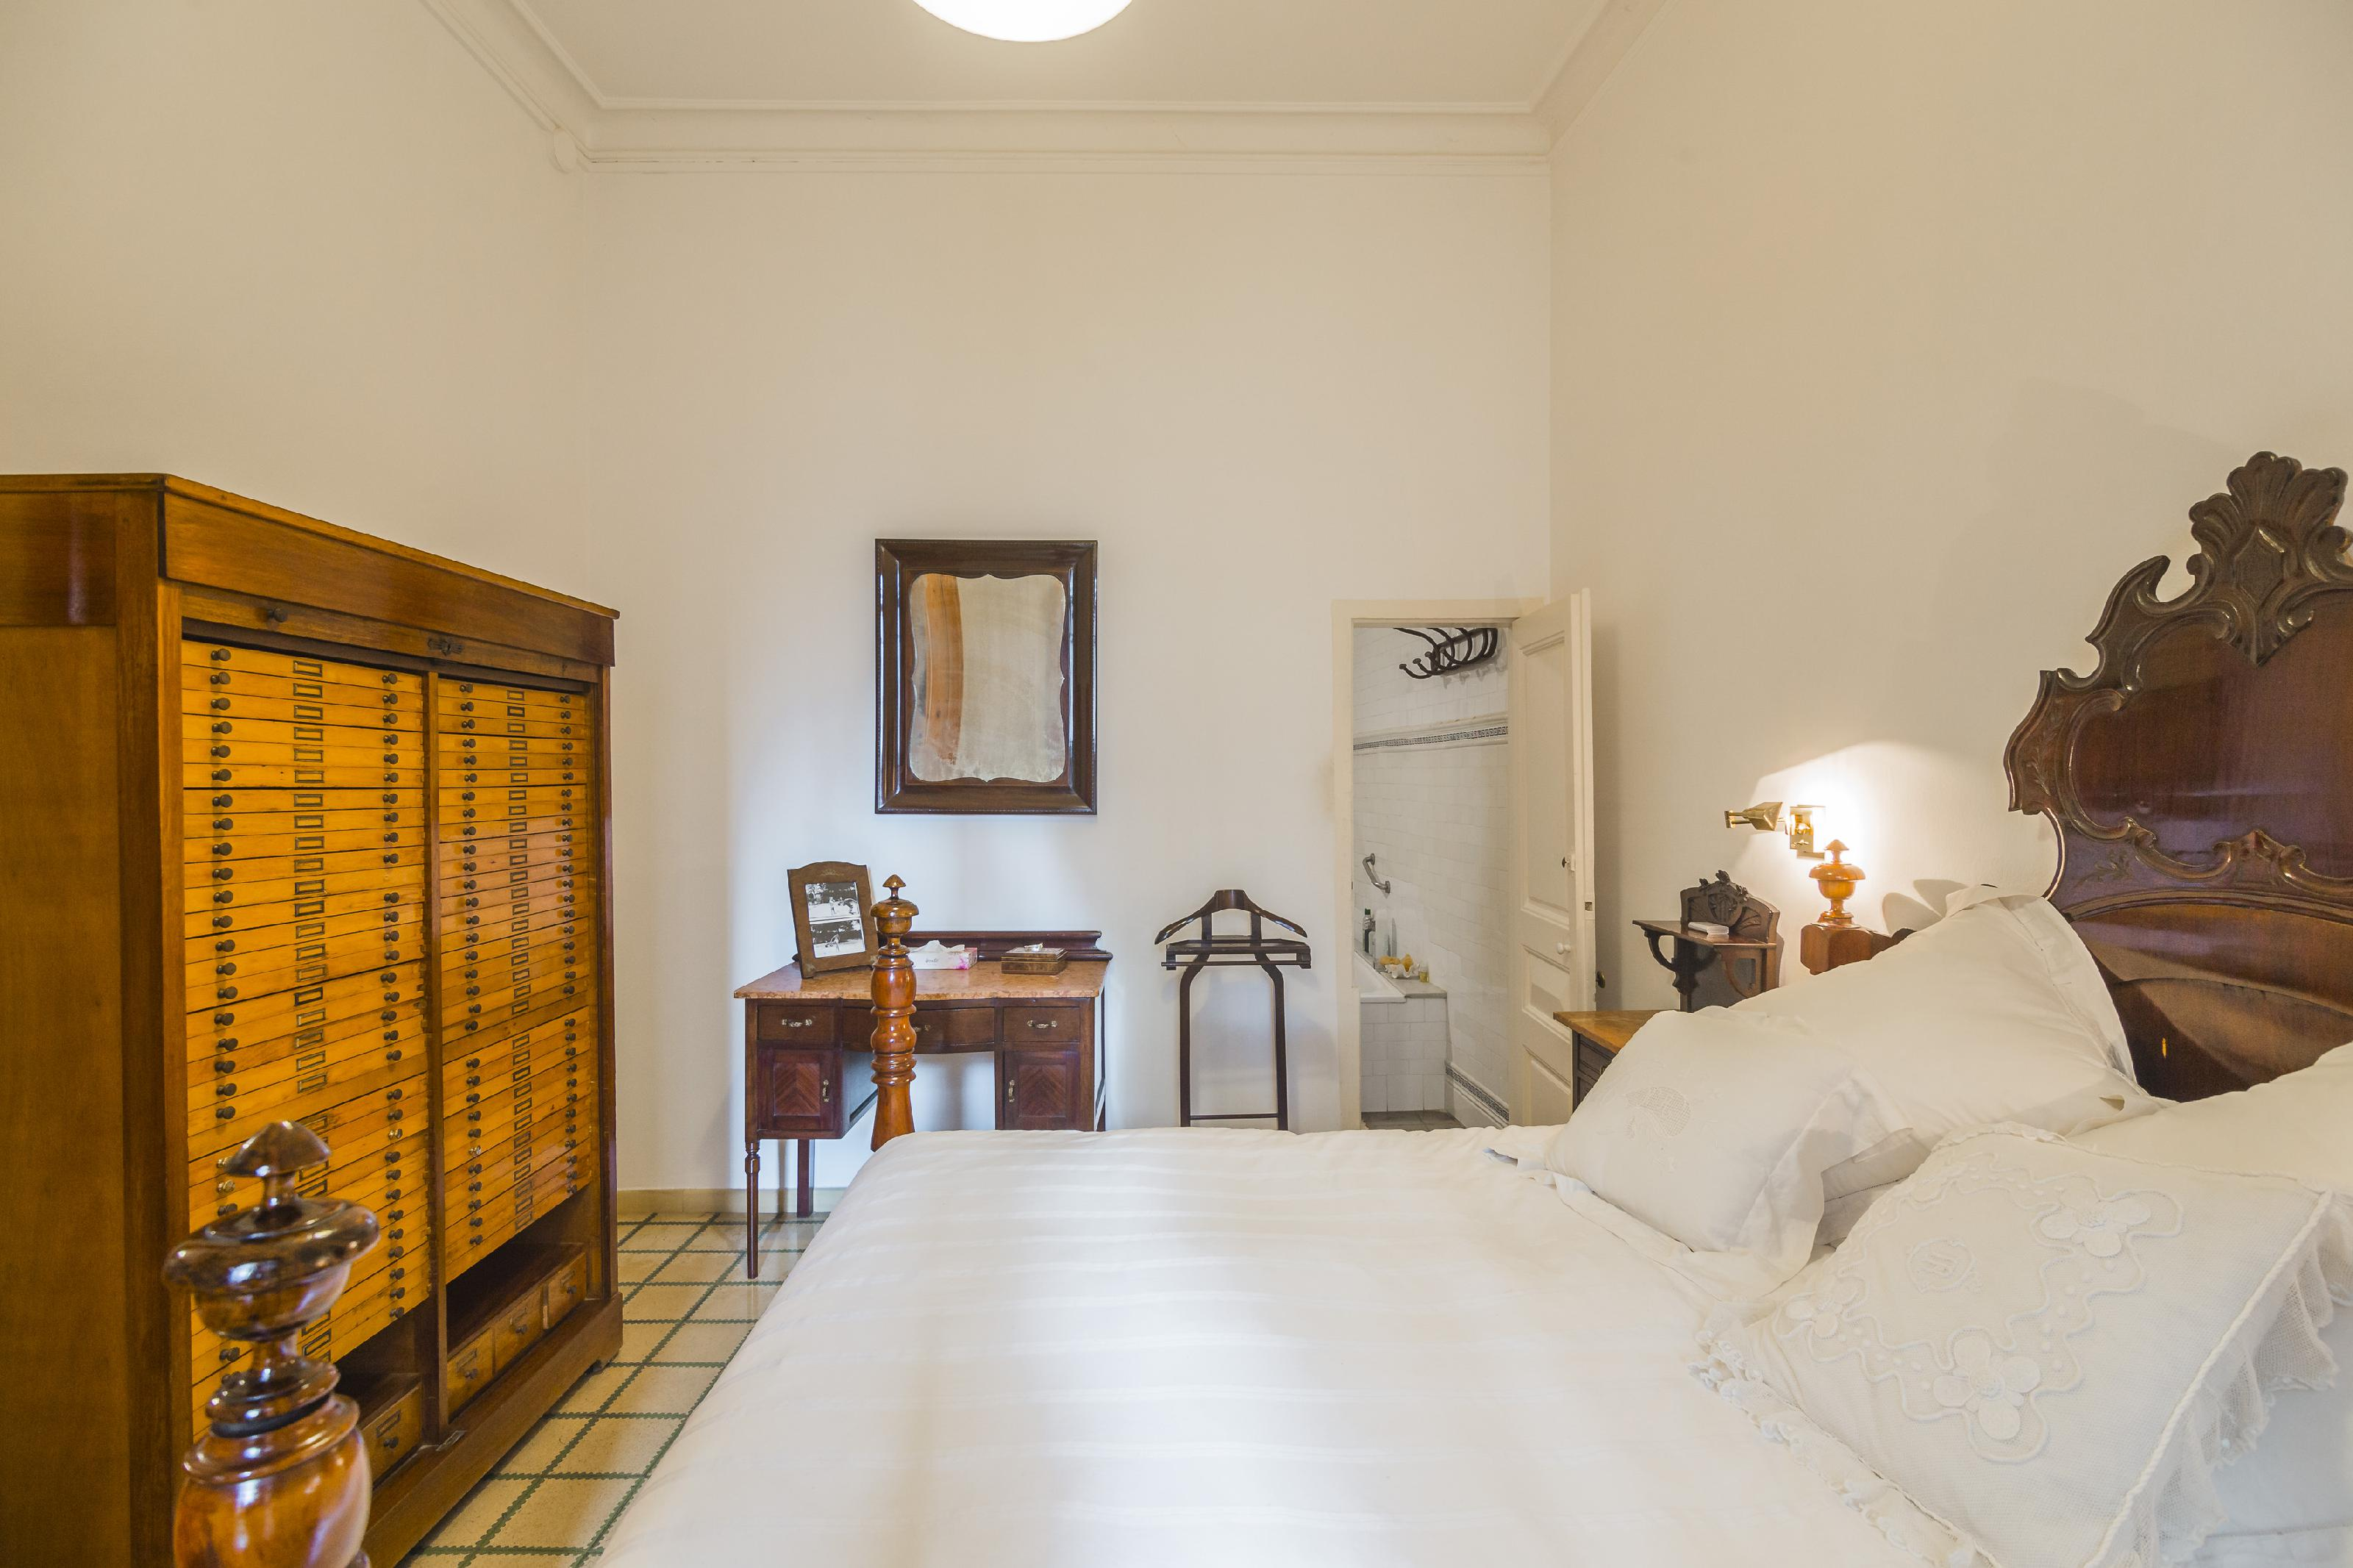 250020 Piso en venda en Gràcia, Vila de Gràcia 24